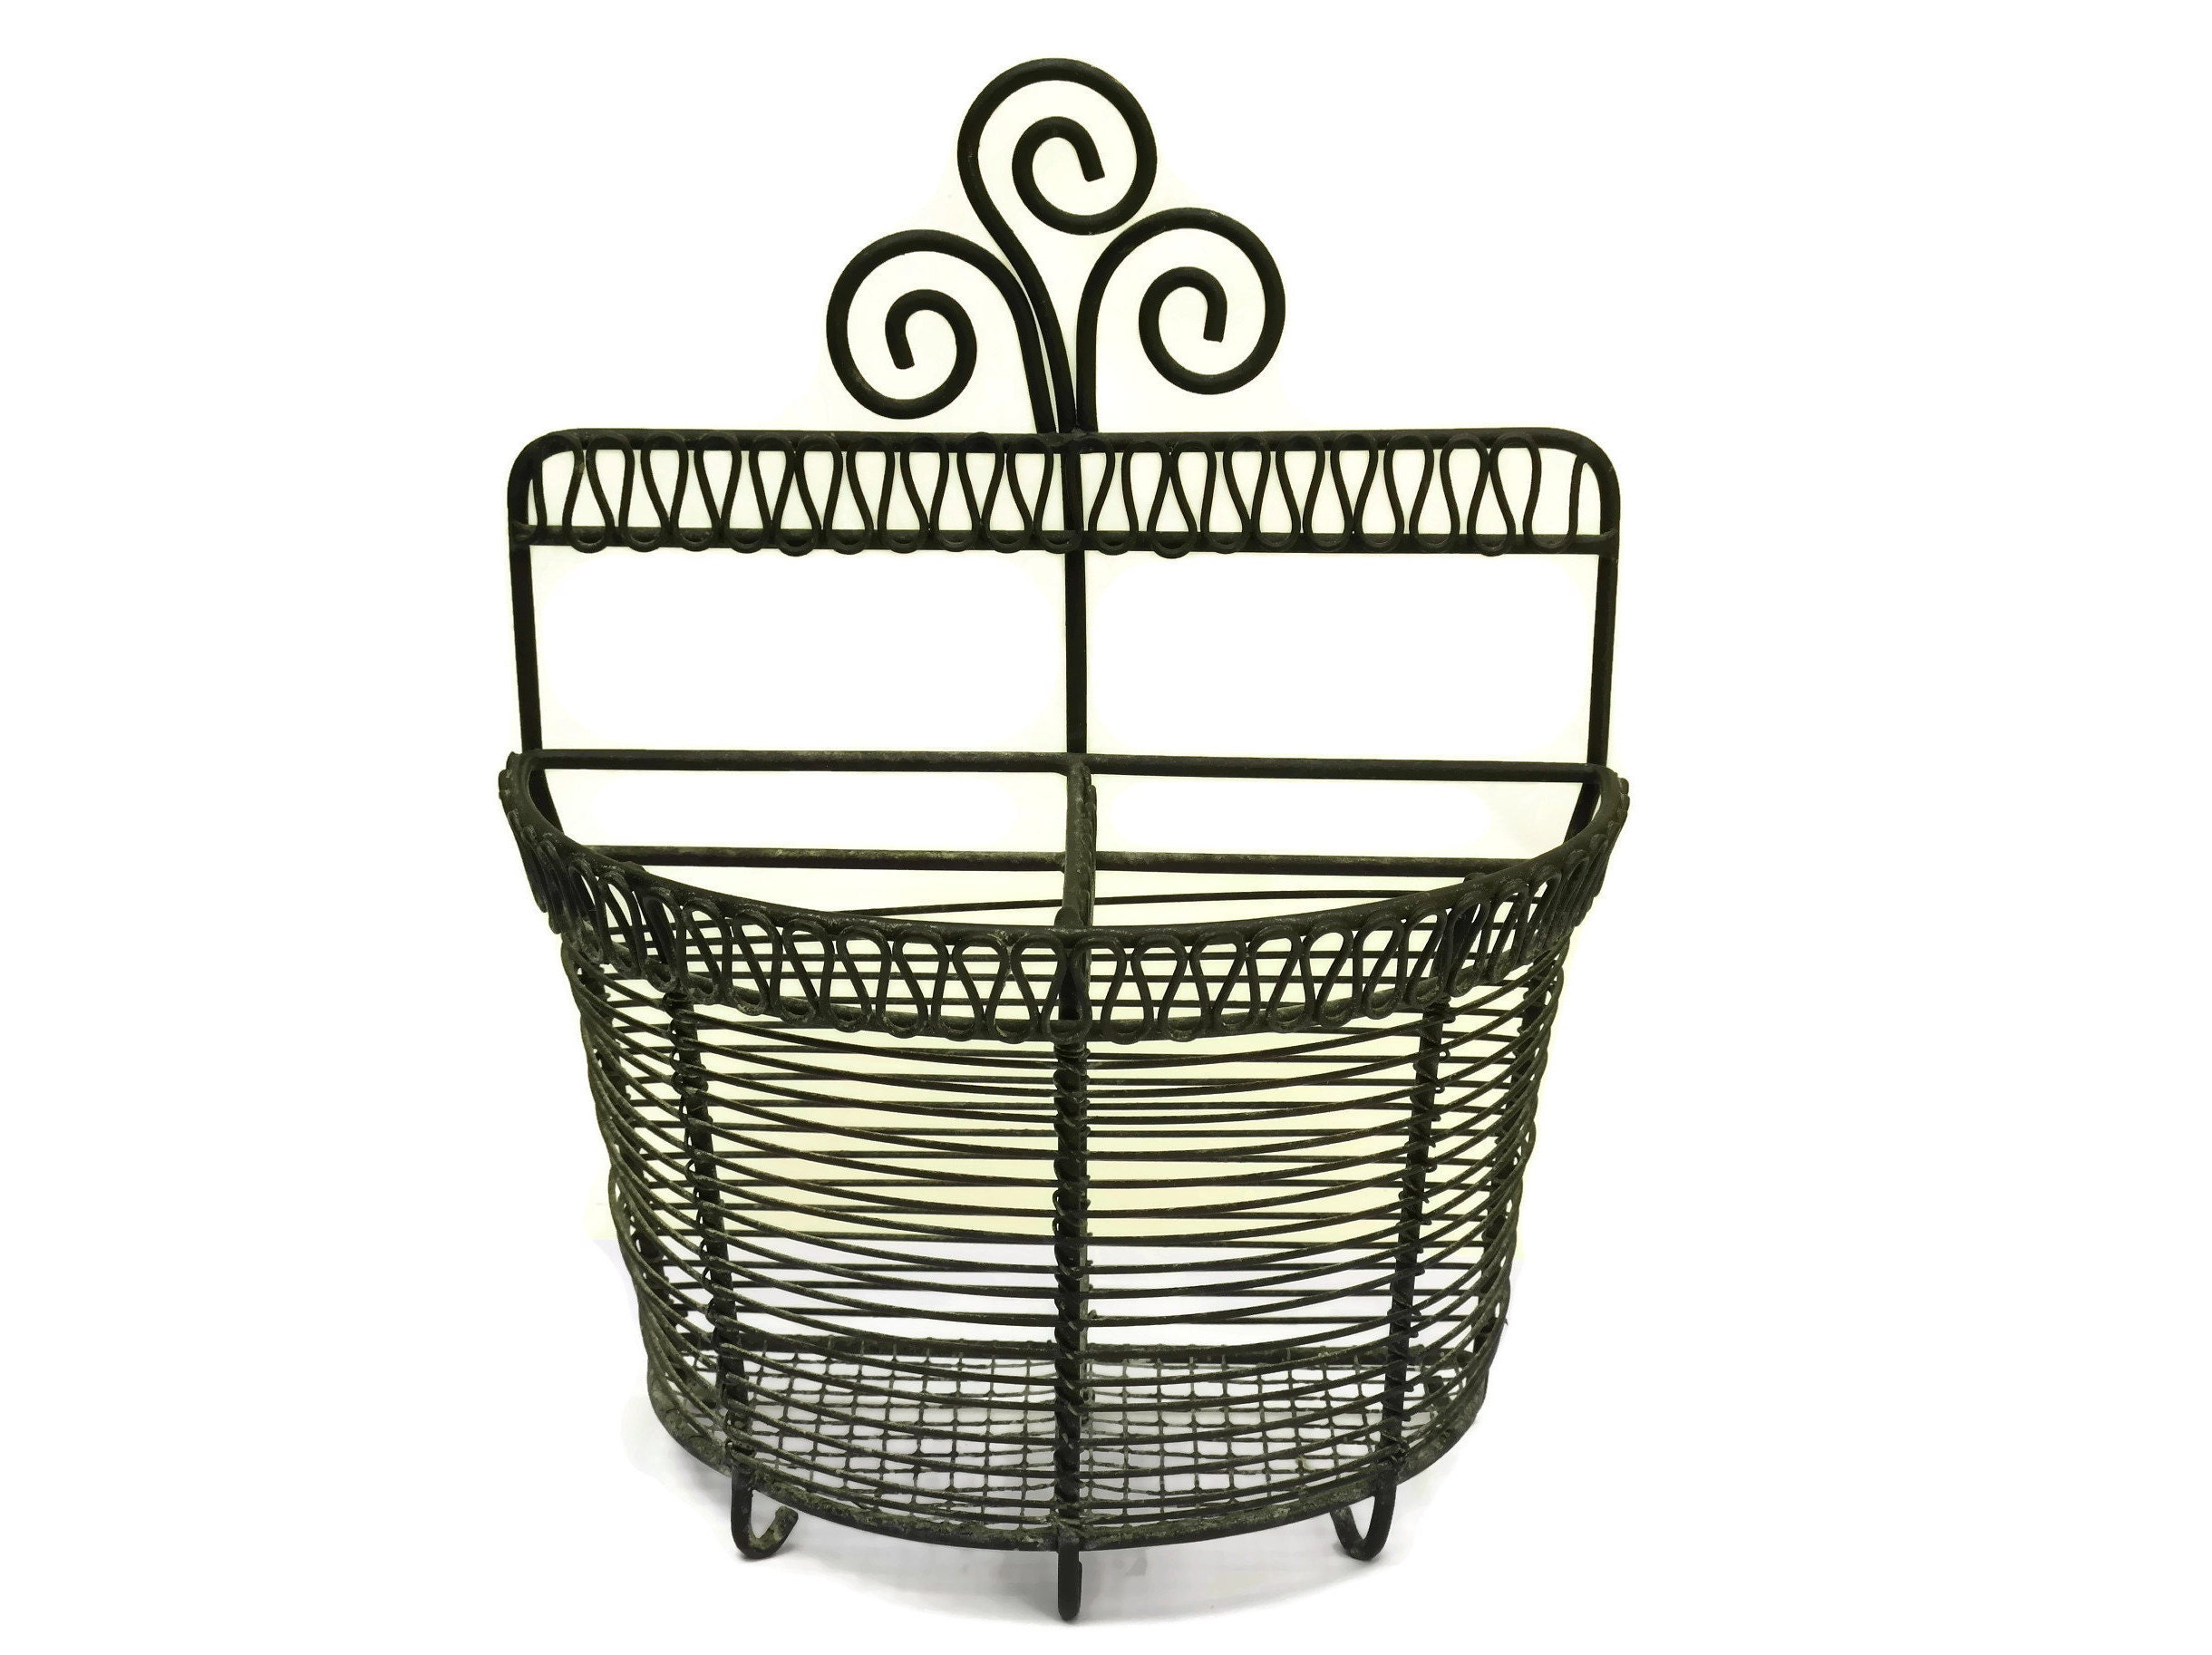 Vintage French Garlic Basket Rustic Country Kitchen Decor